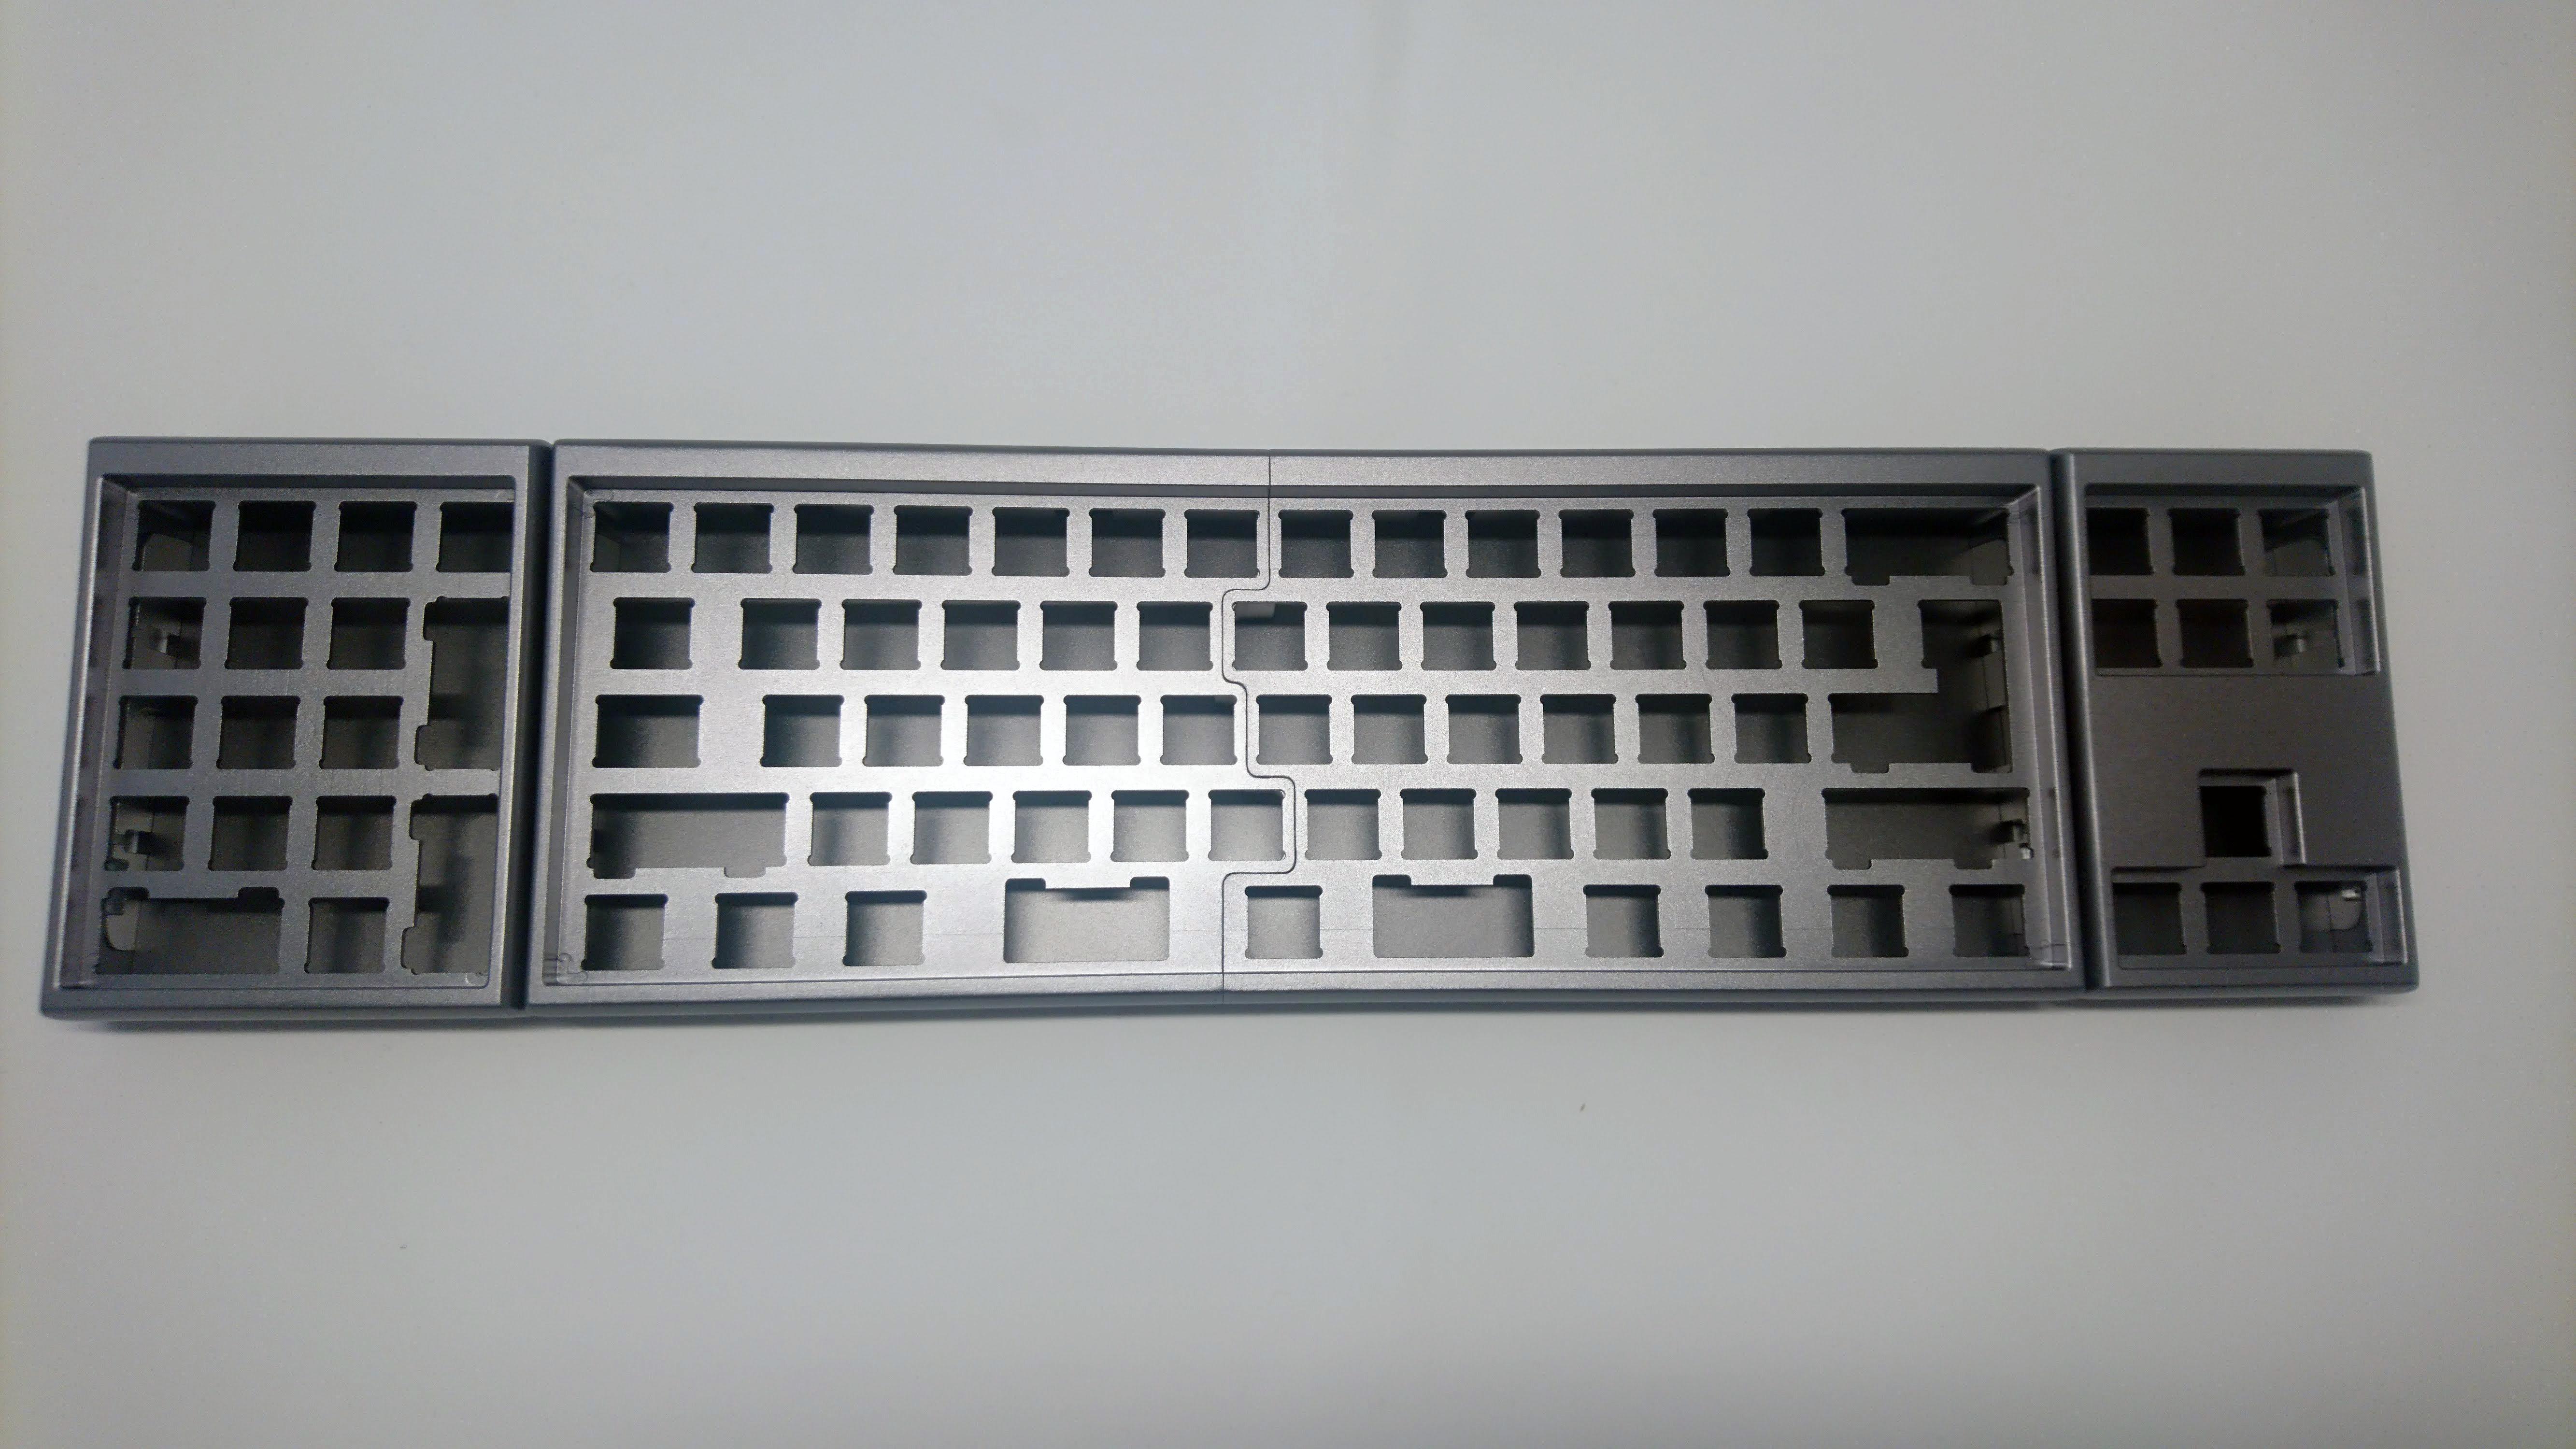 DC01 Left Half